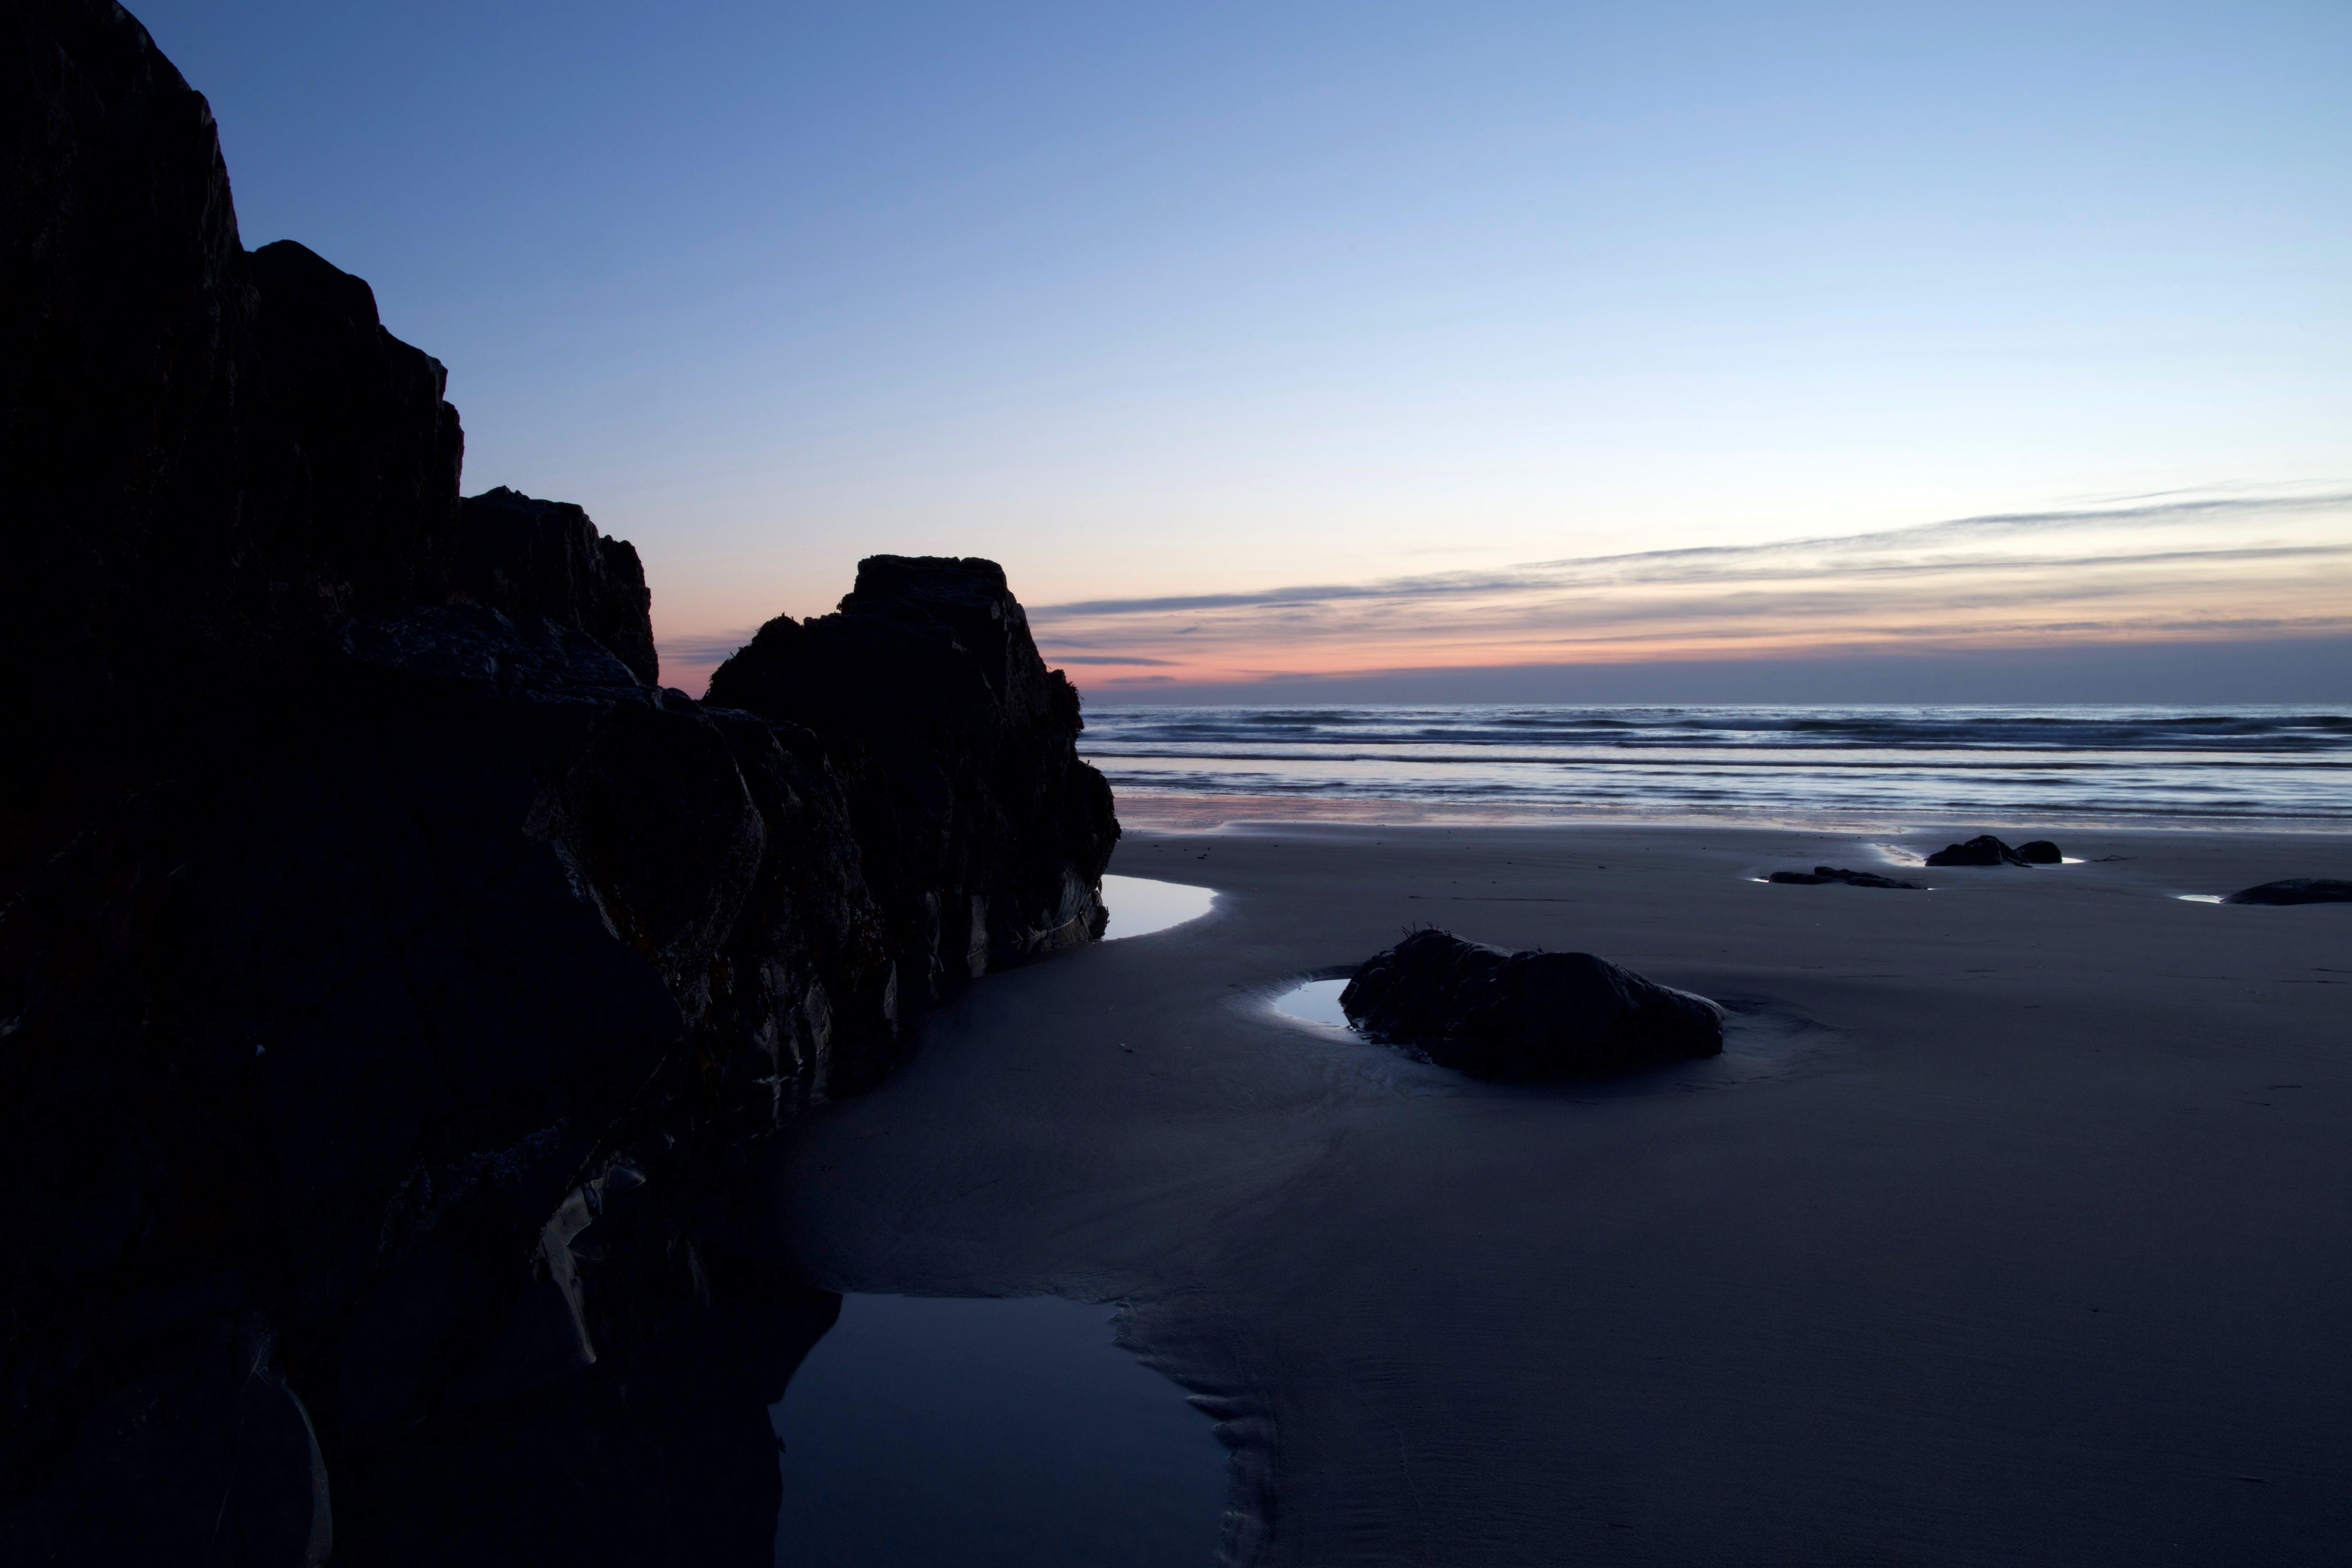 Black Rock Beside Seashore